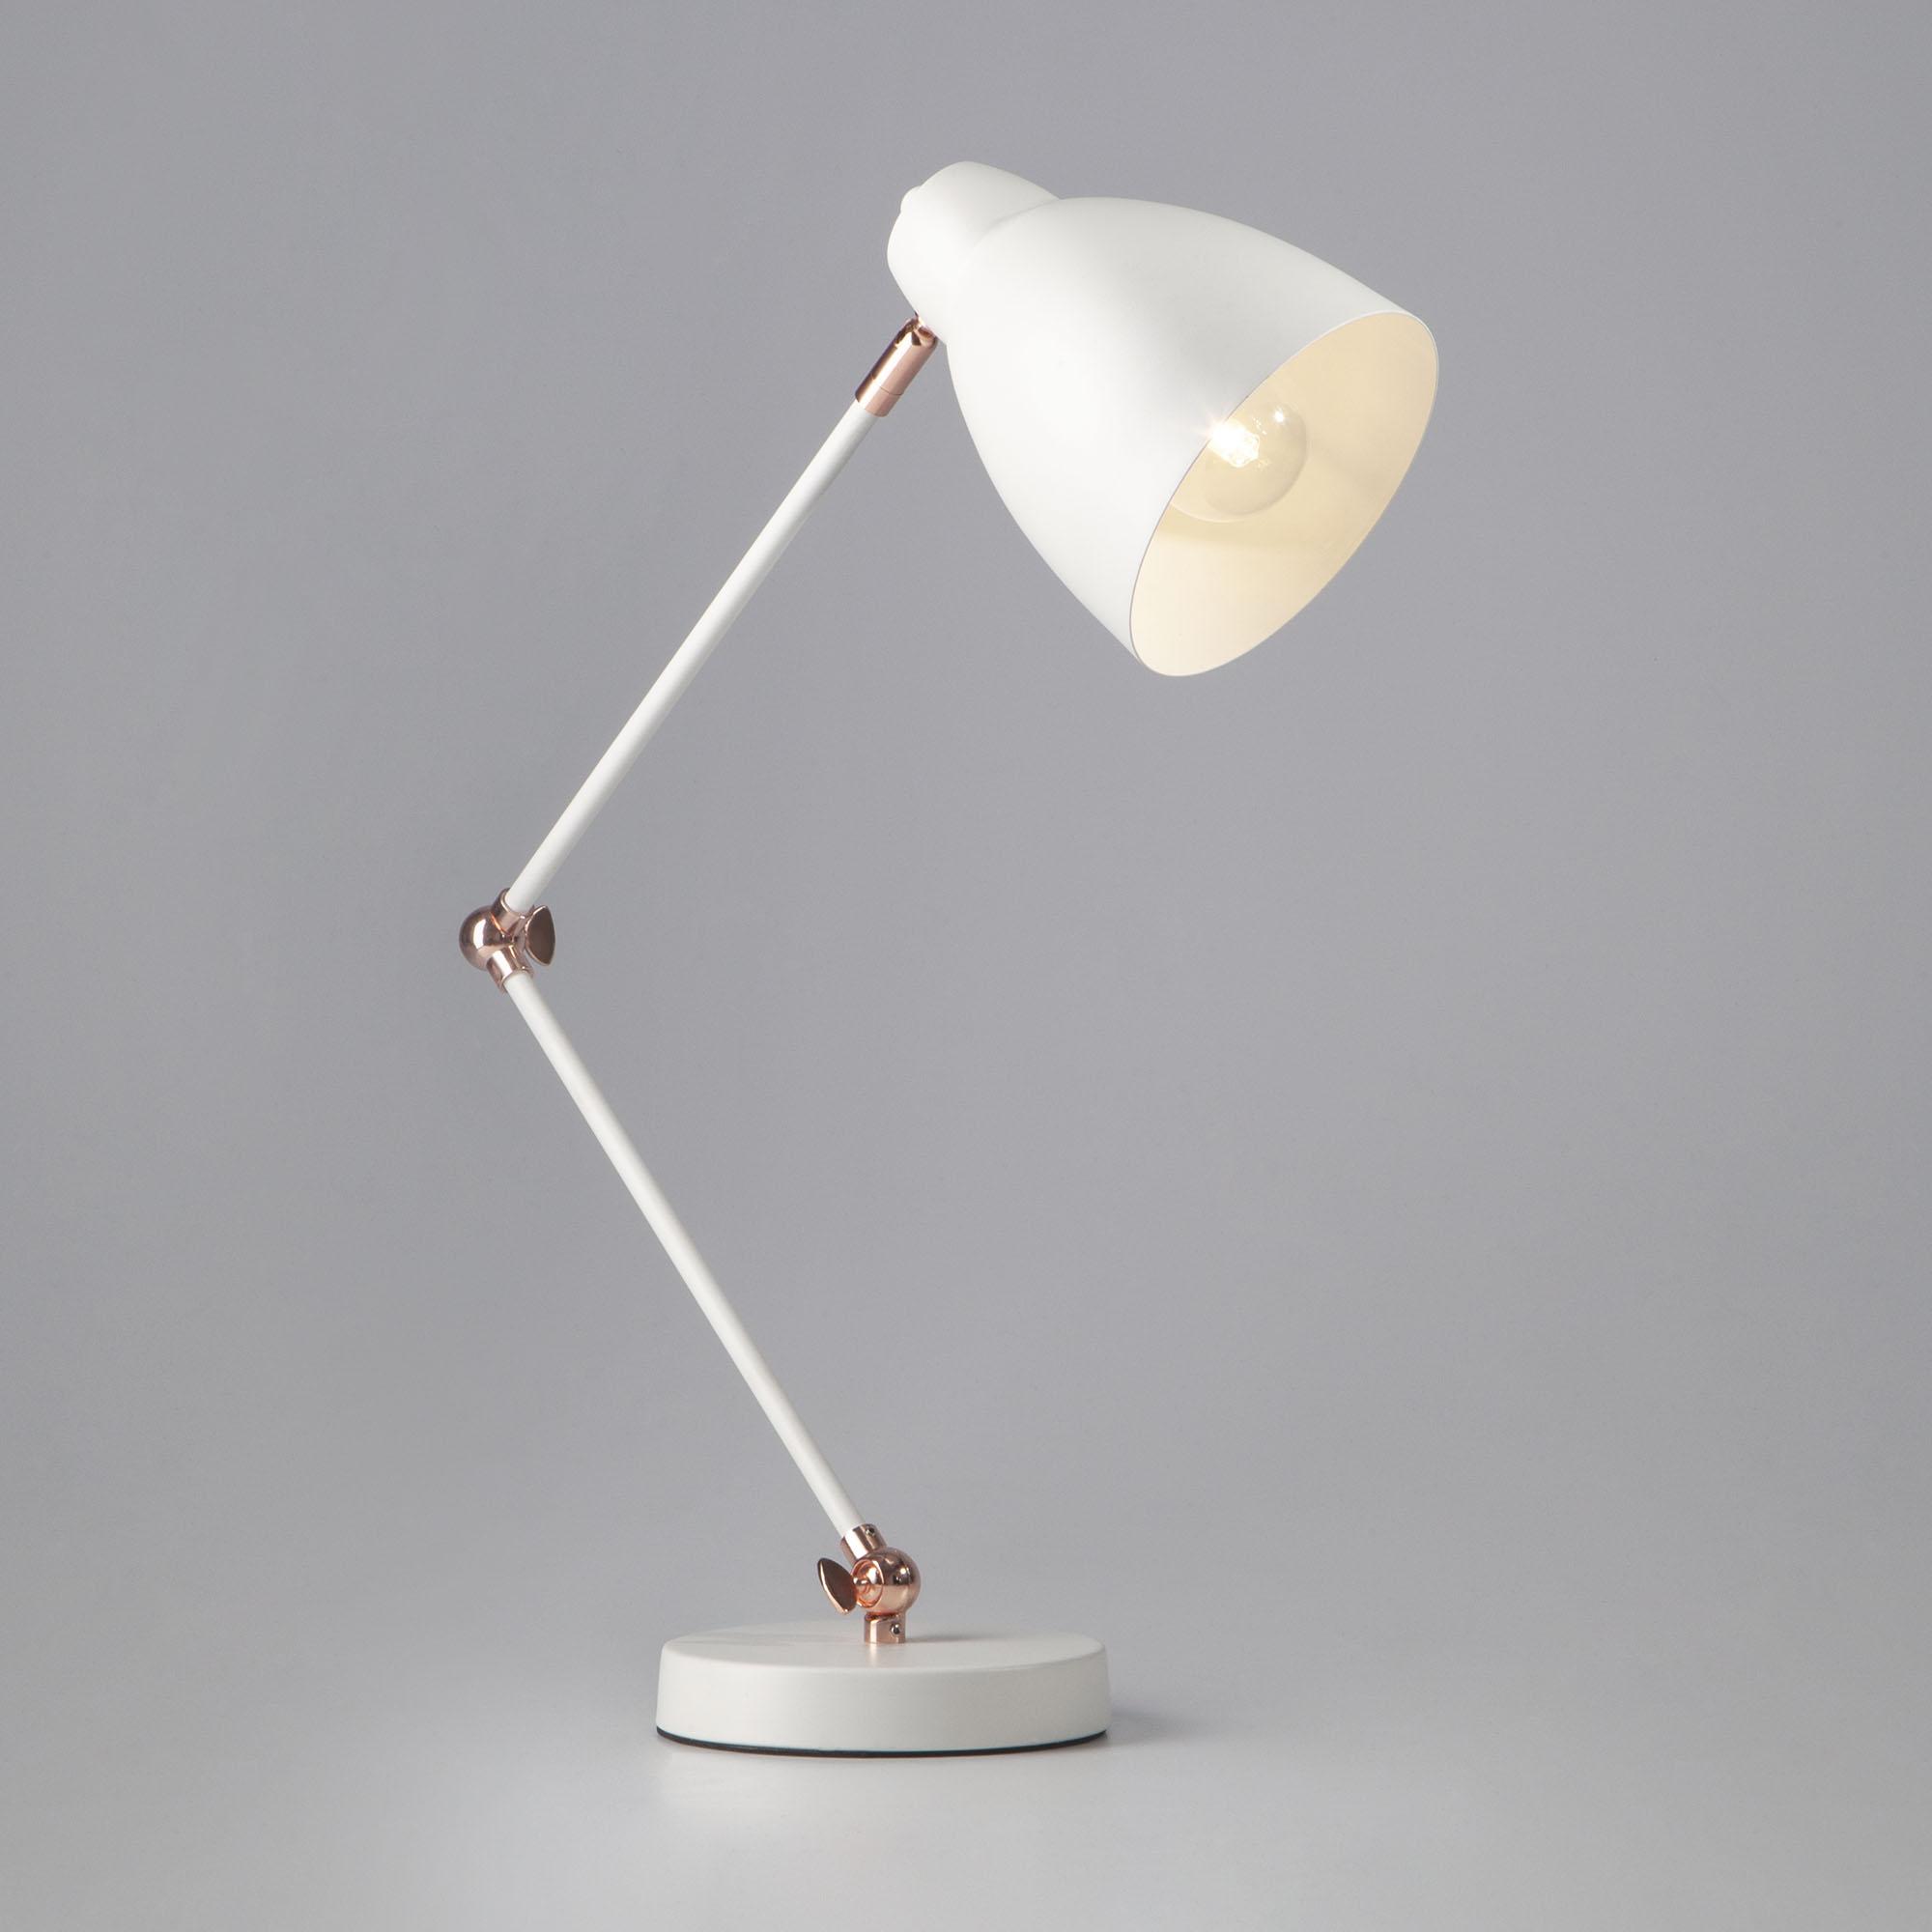 Выбираем настольную лампу